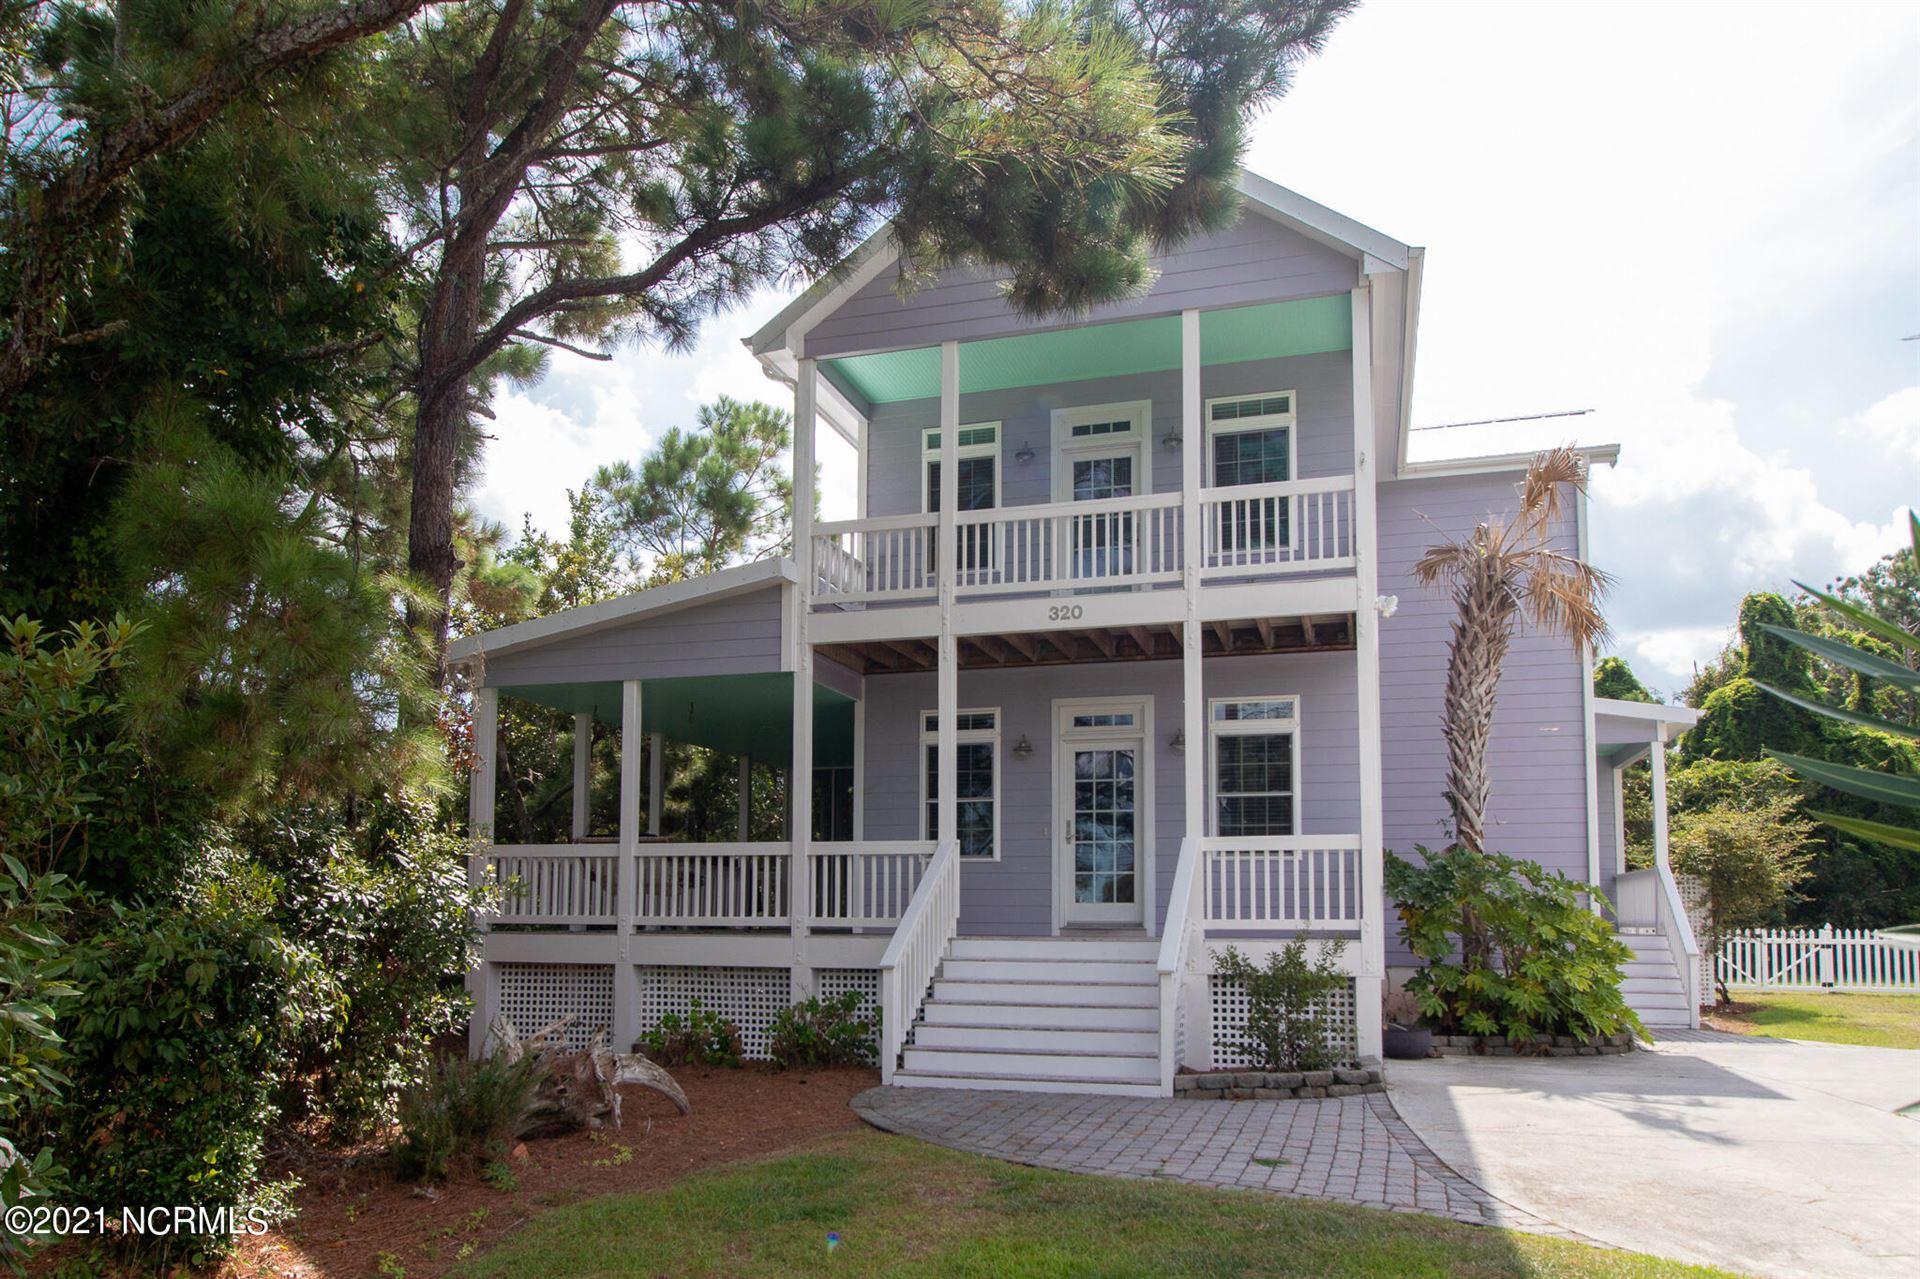 Photo of 320 Governor Safford Lane, Emerald Isle, NC 28594 (MLS # 100289761)